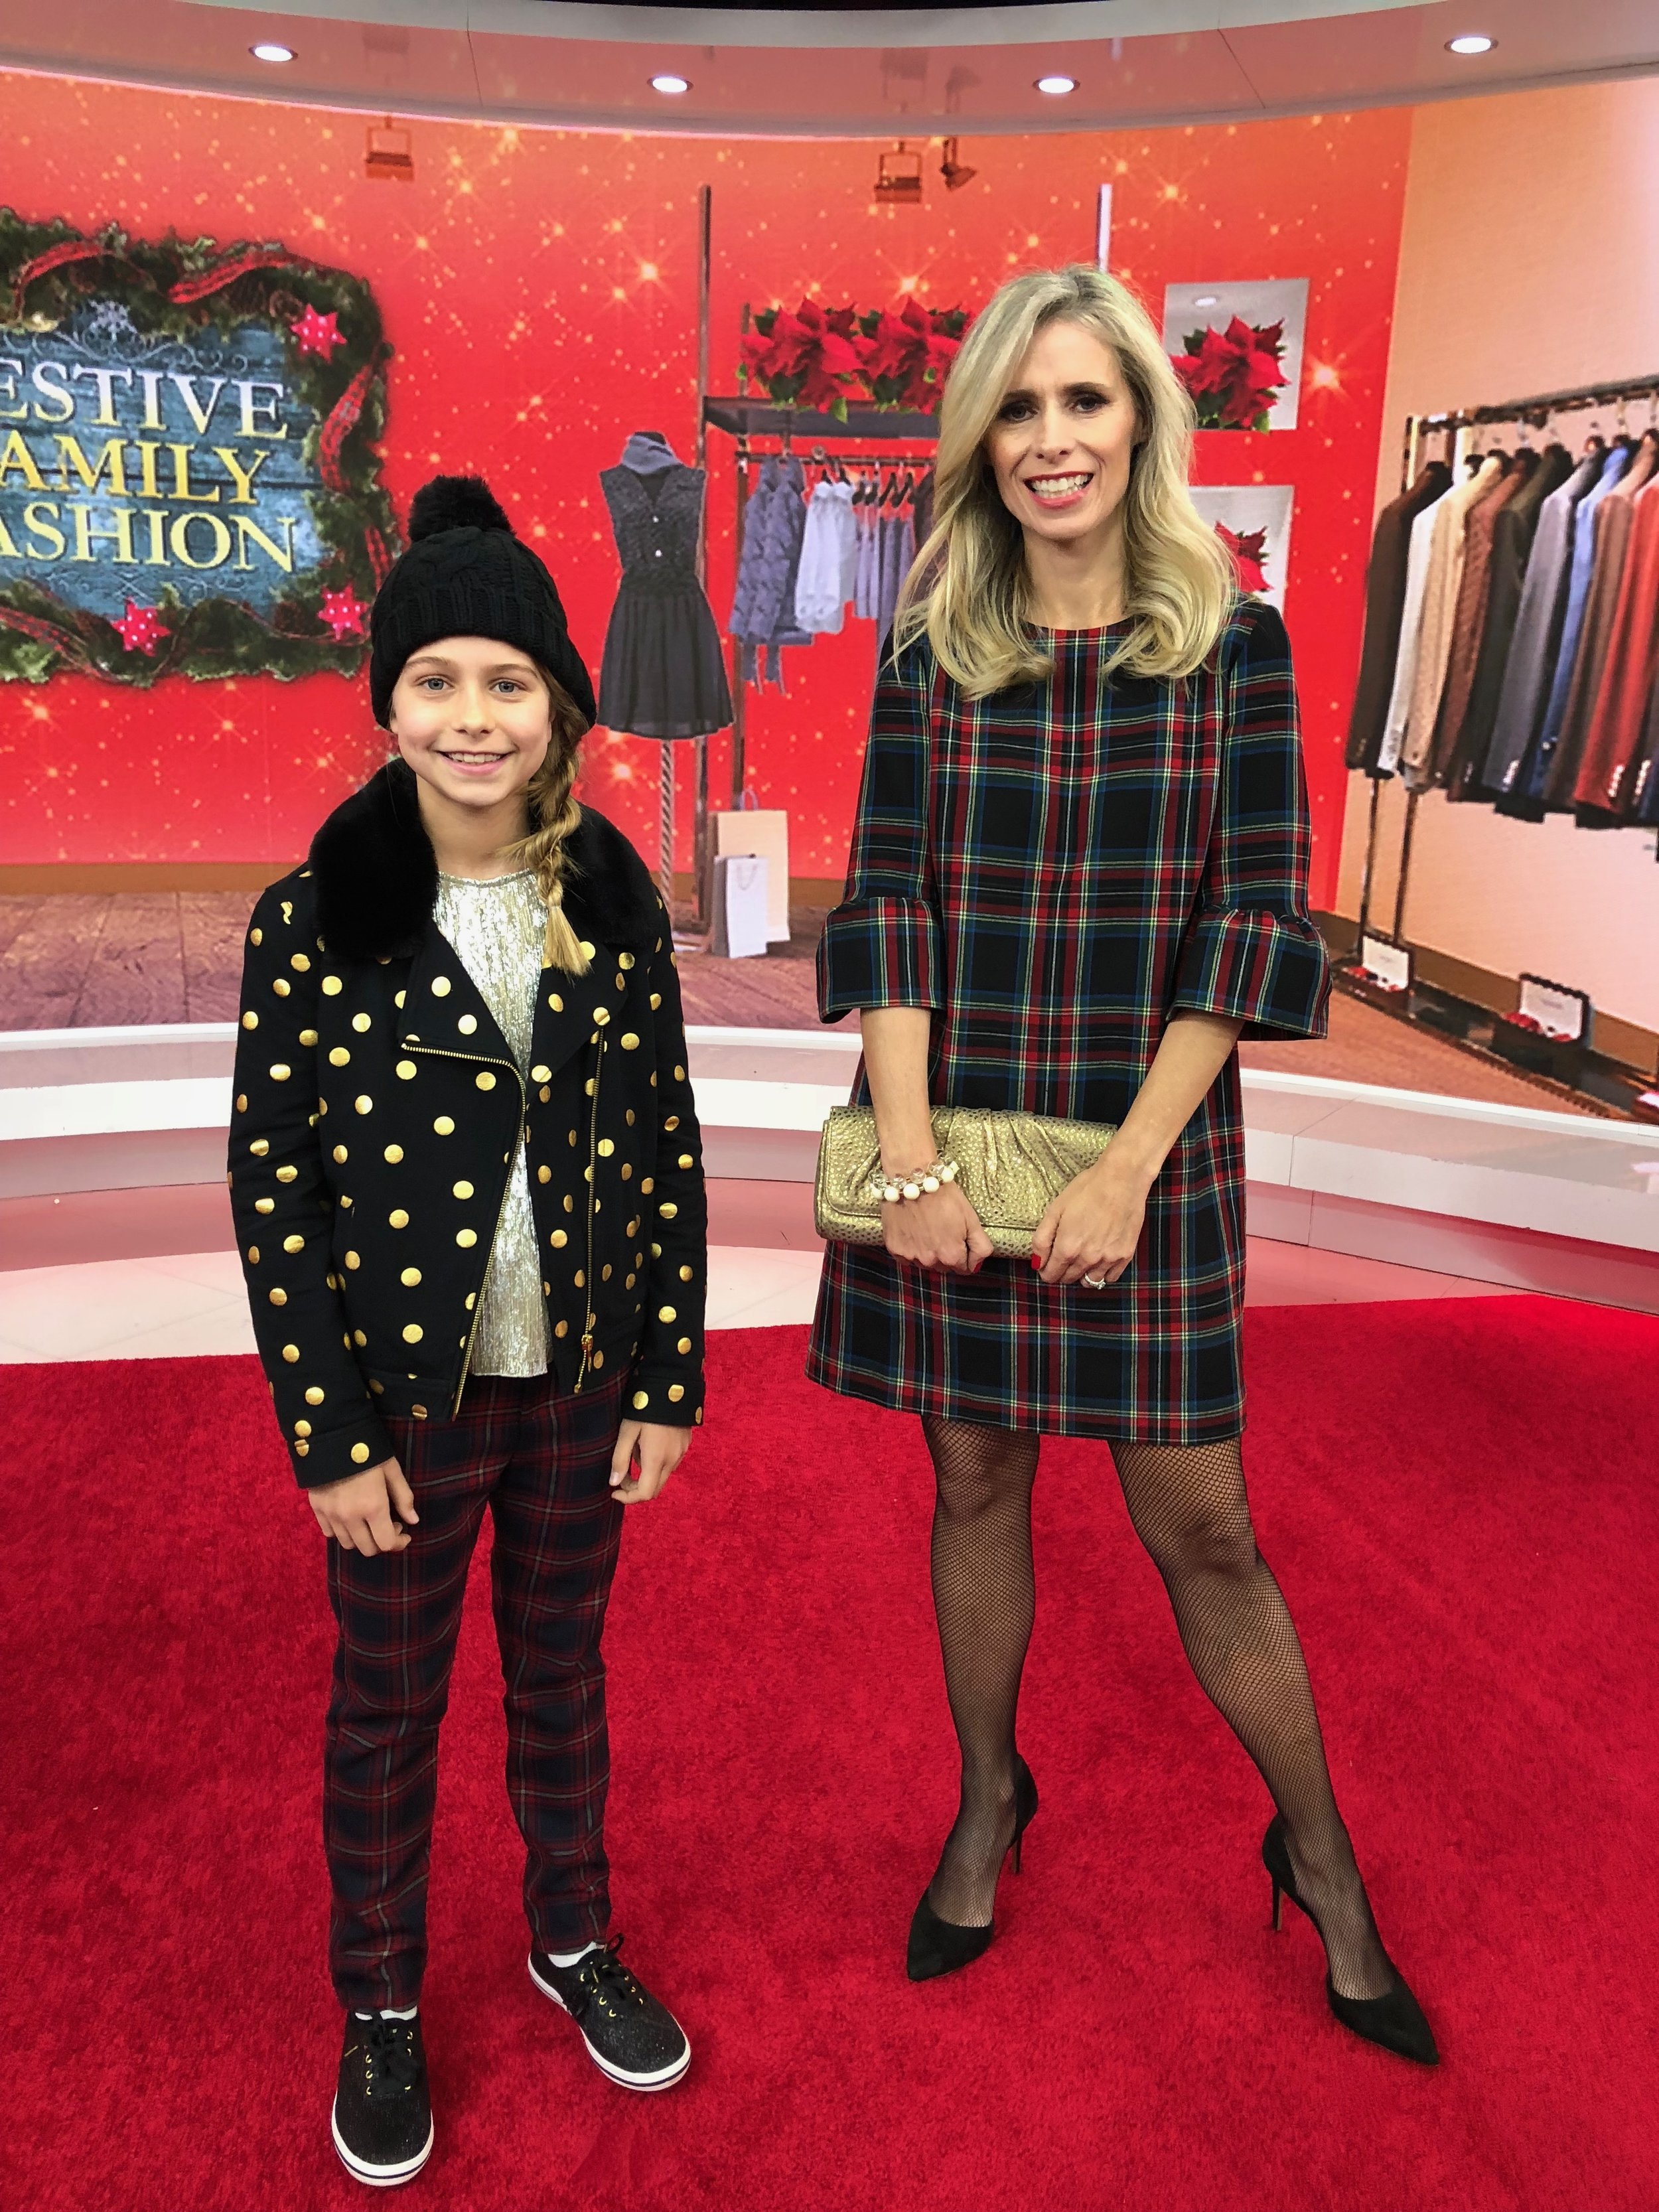 Playful Polka Dots & Plaids Holiday Family Fashions by fashion expert Amy E. Goodman